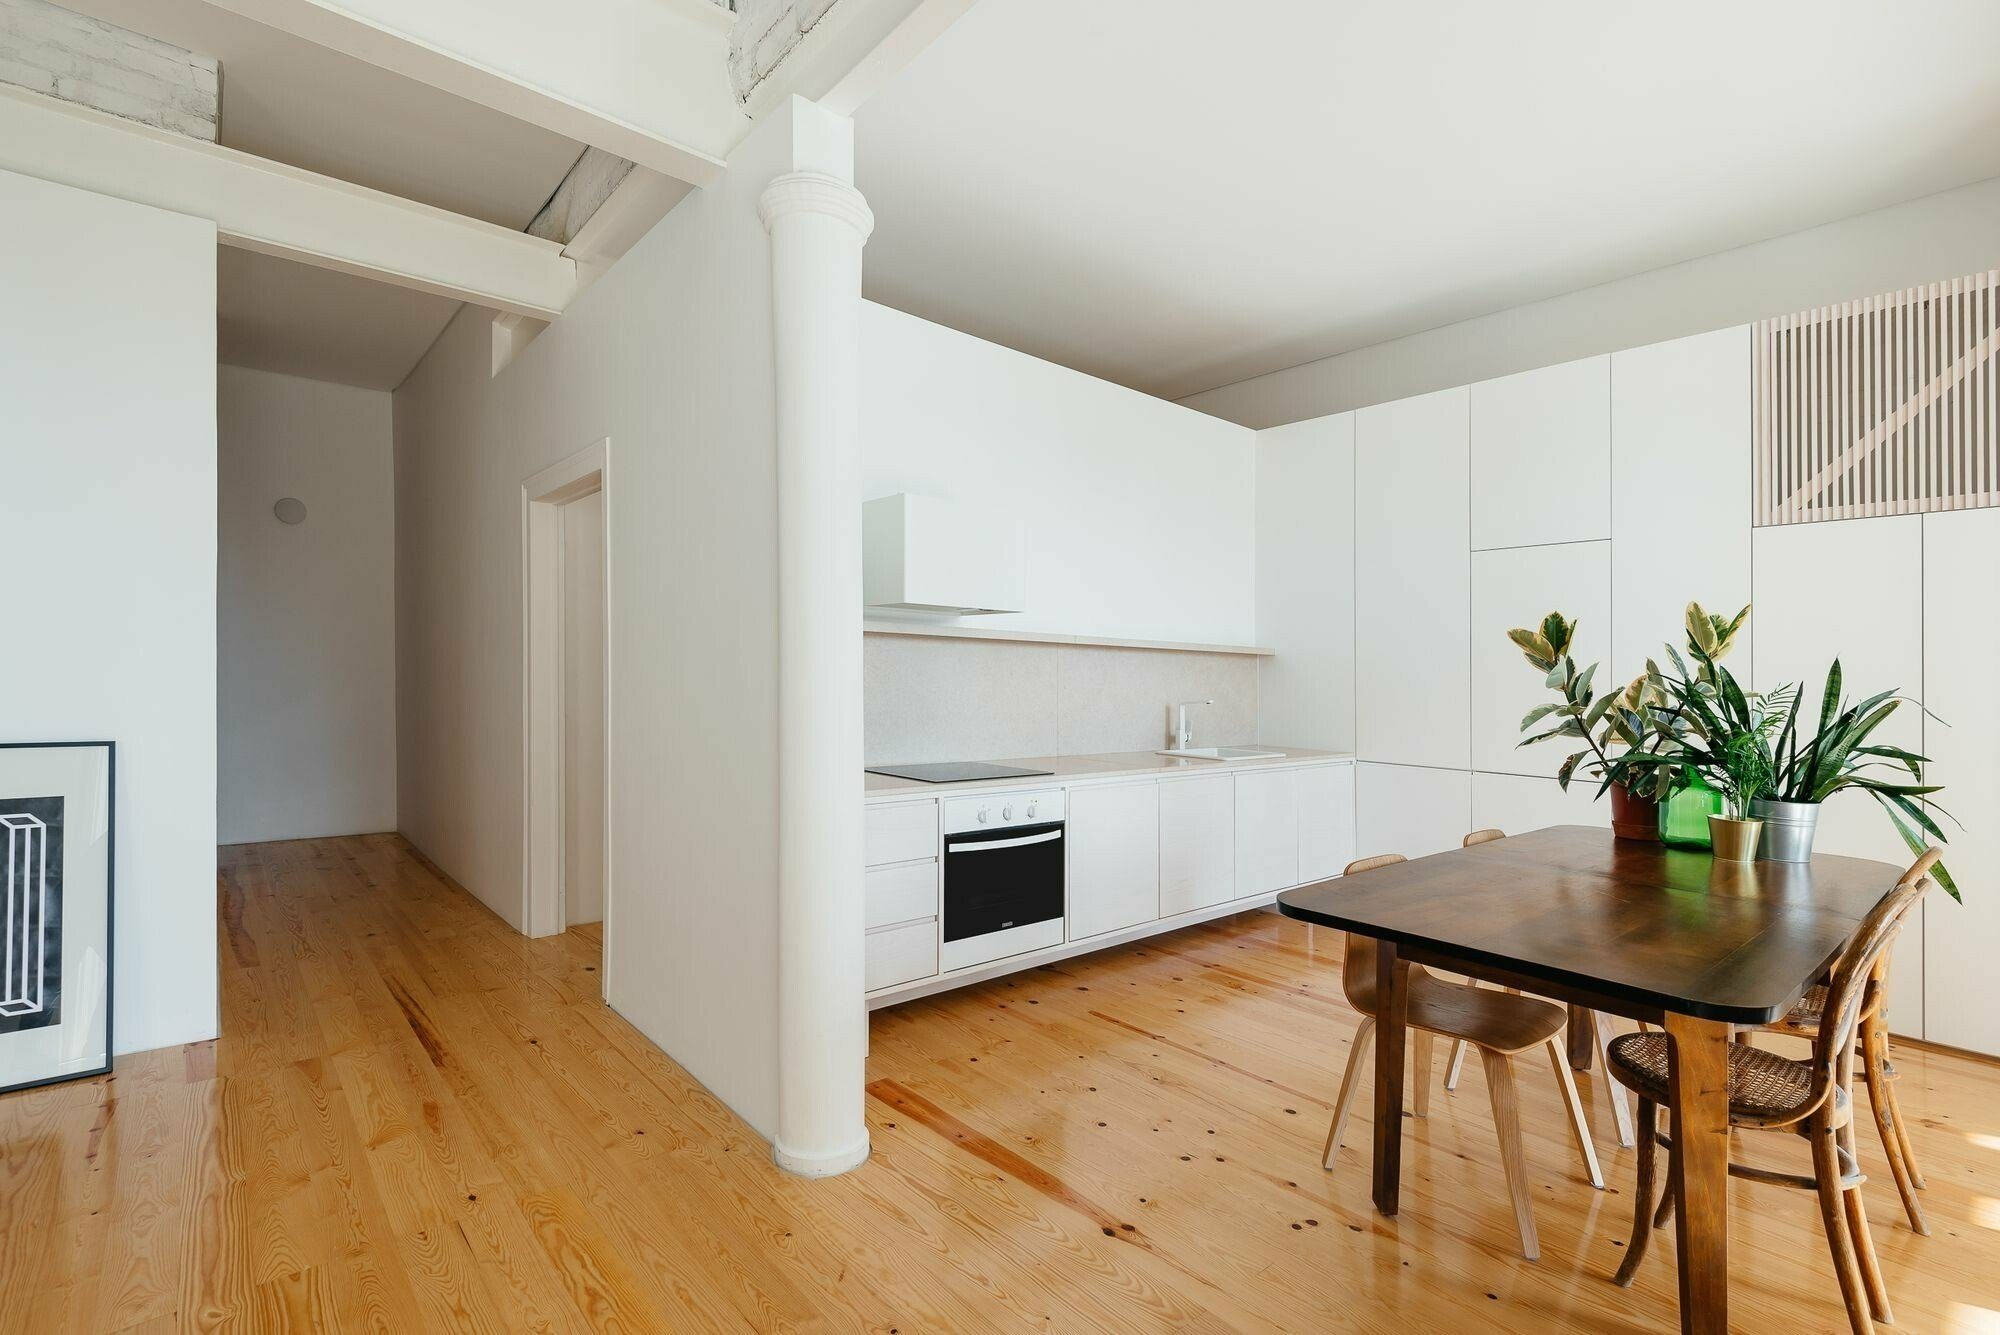 minimalizm-v-interere-foto_11-6245313